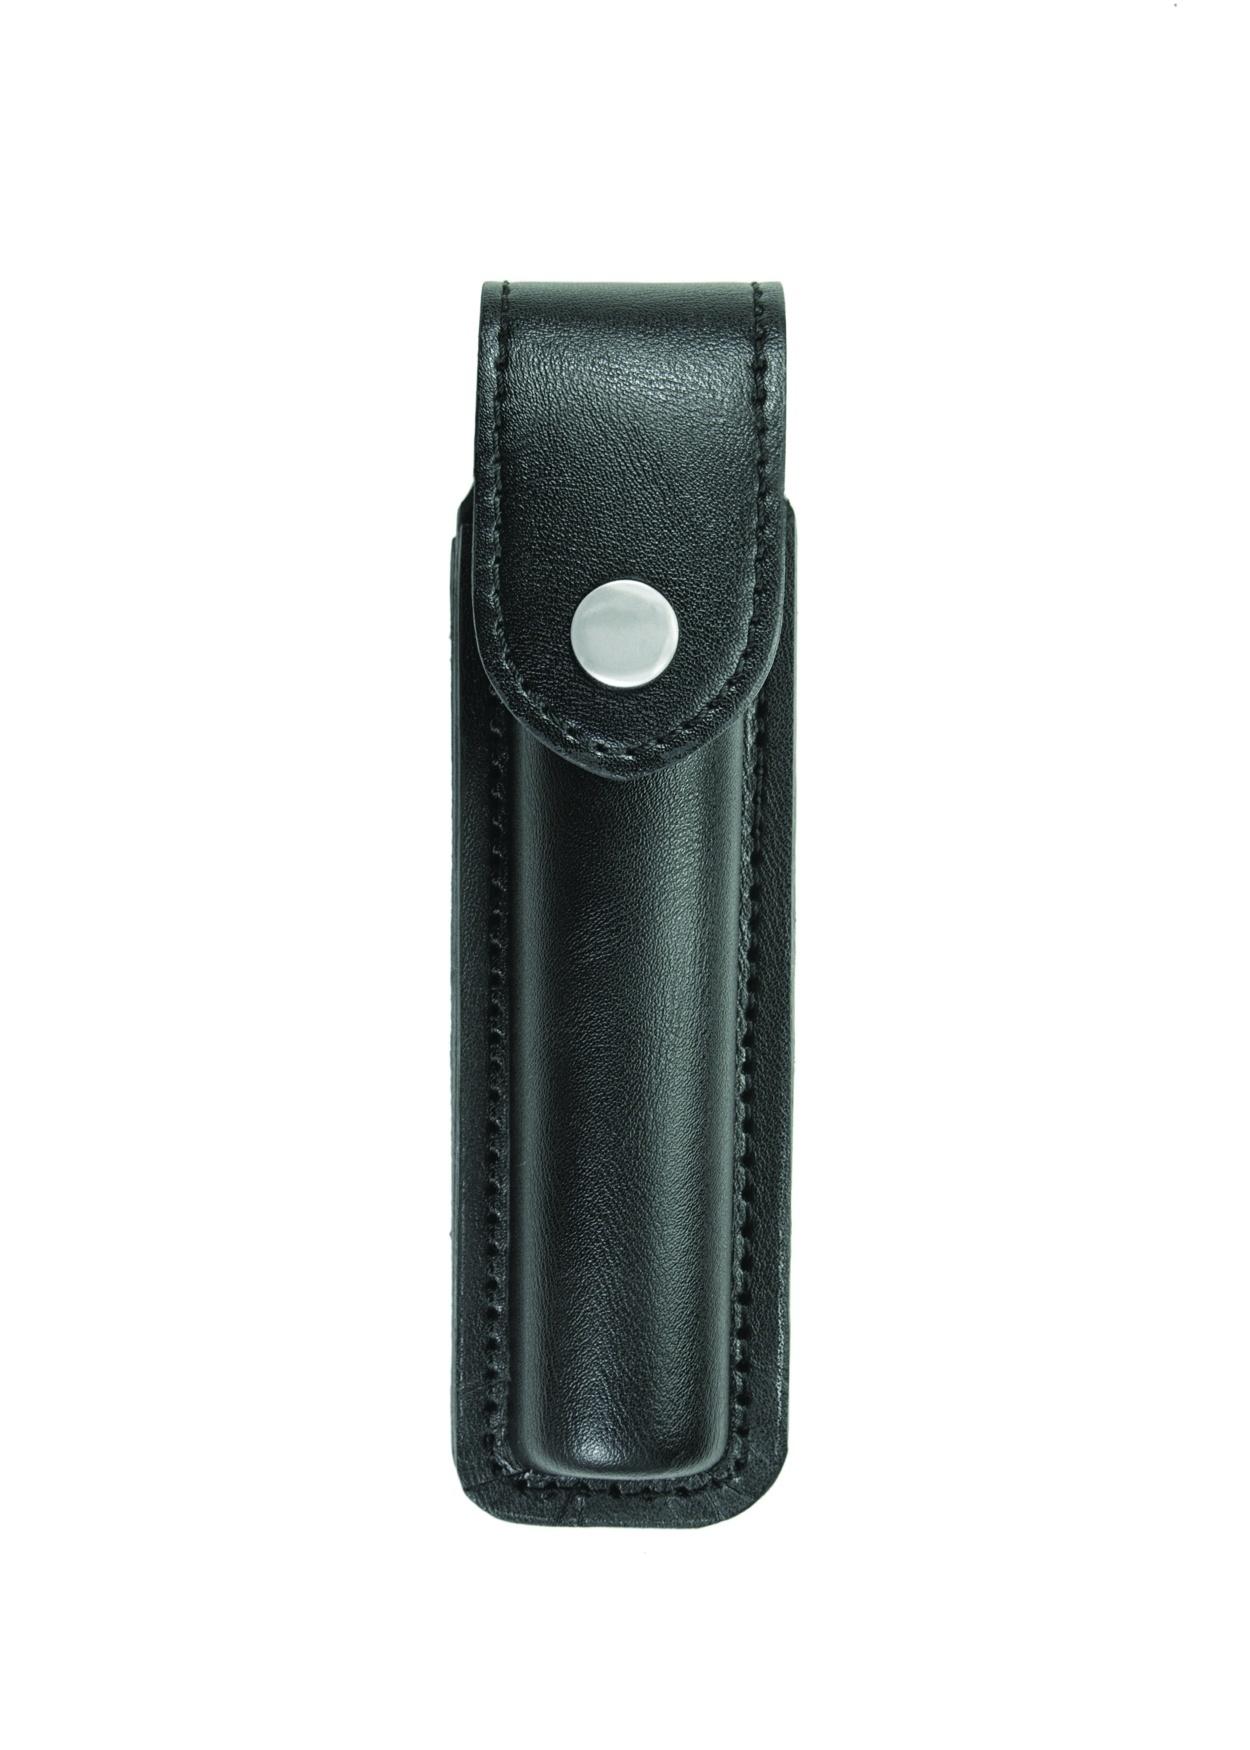 Flashlight Case, Small AA LED, AirTek, Smooth, Nickel Snap-Hero's Pride